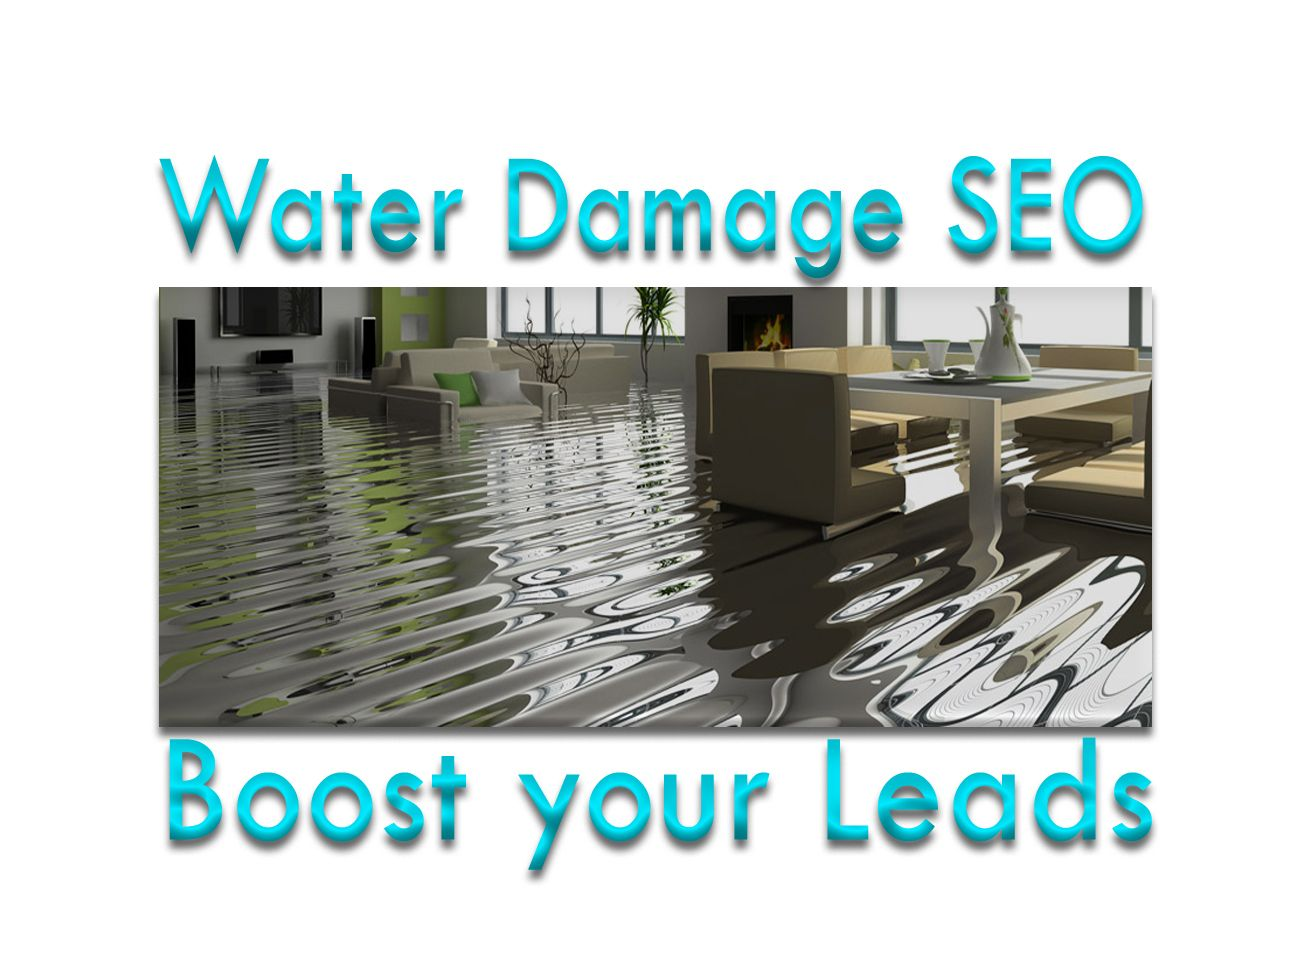 Water Damage Marketing (Google SEO, Google Ads, & More